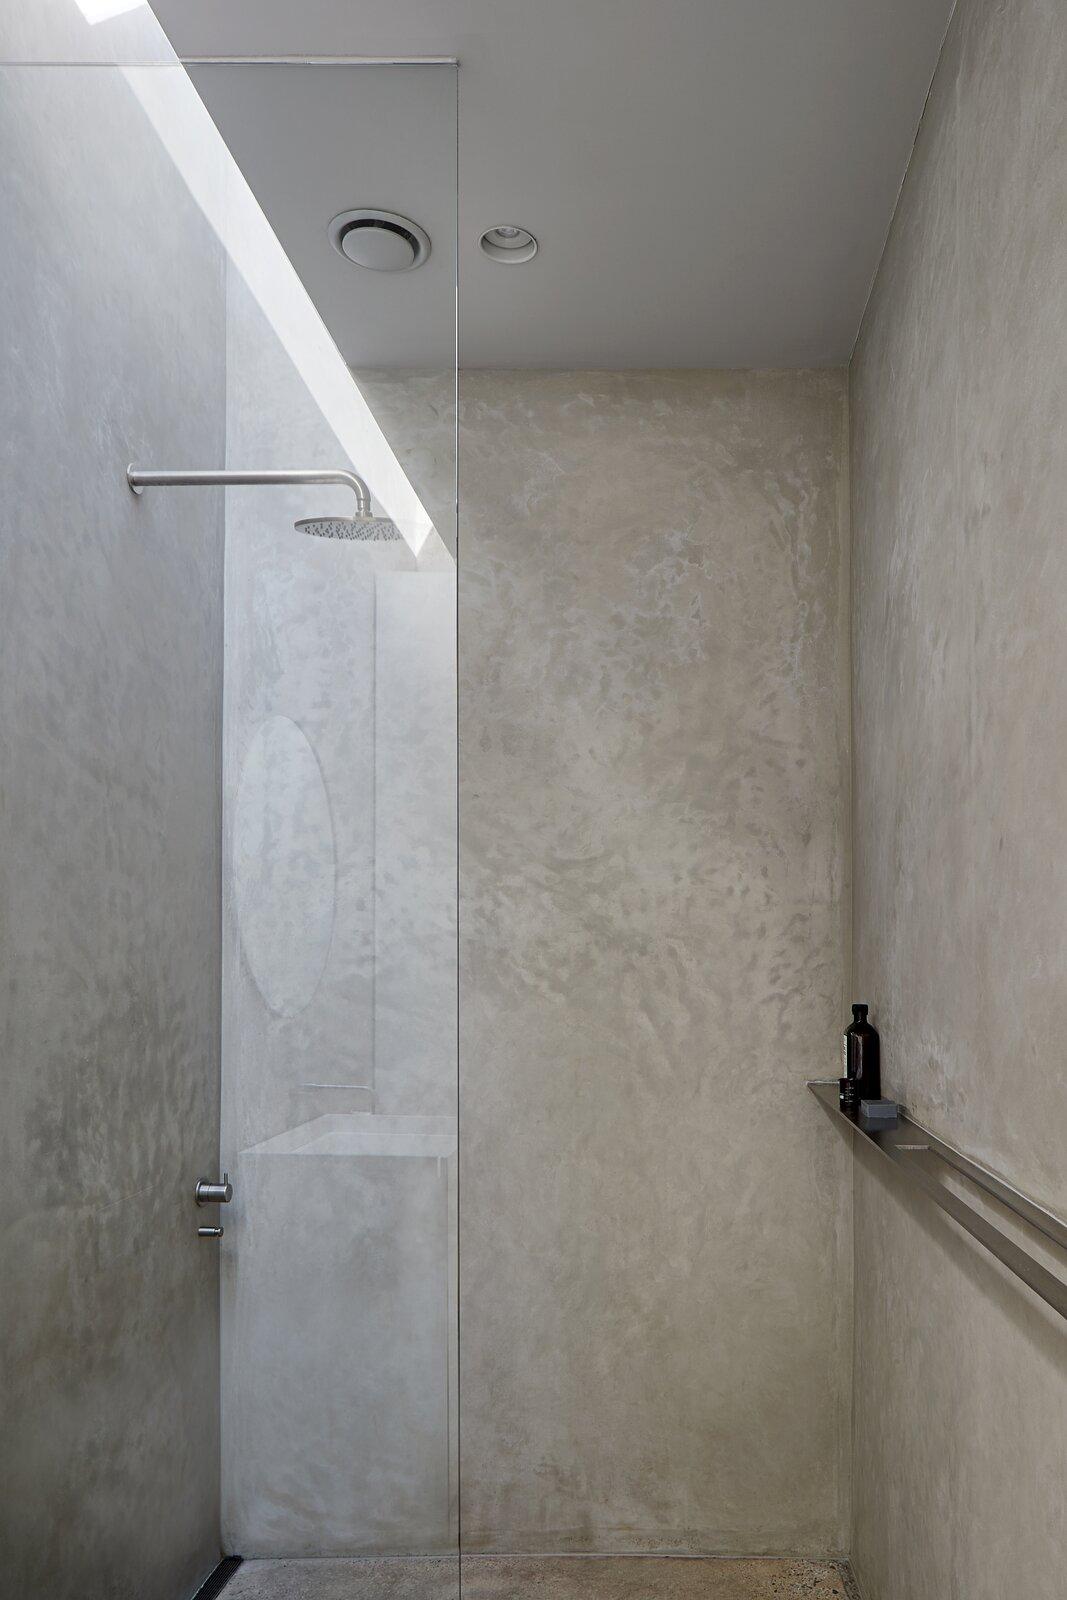 Bath Room, Concrete Floor, Recessed Lighting, Ceiling Lighting, and Corner Shower  Ruxton Rise Residence